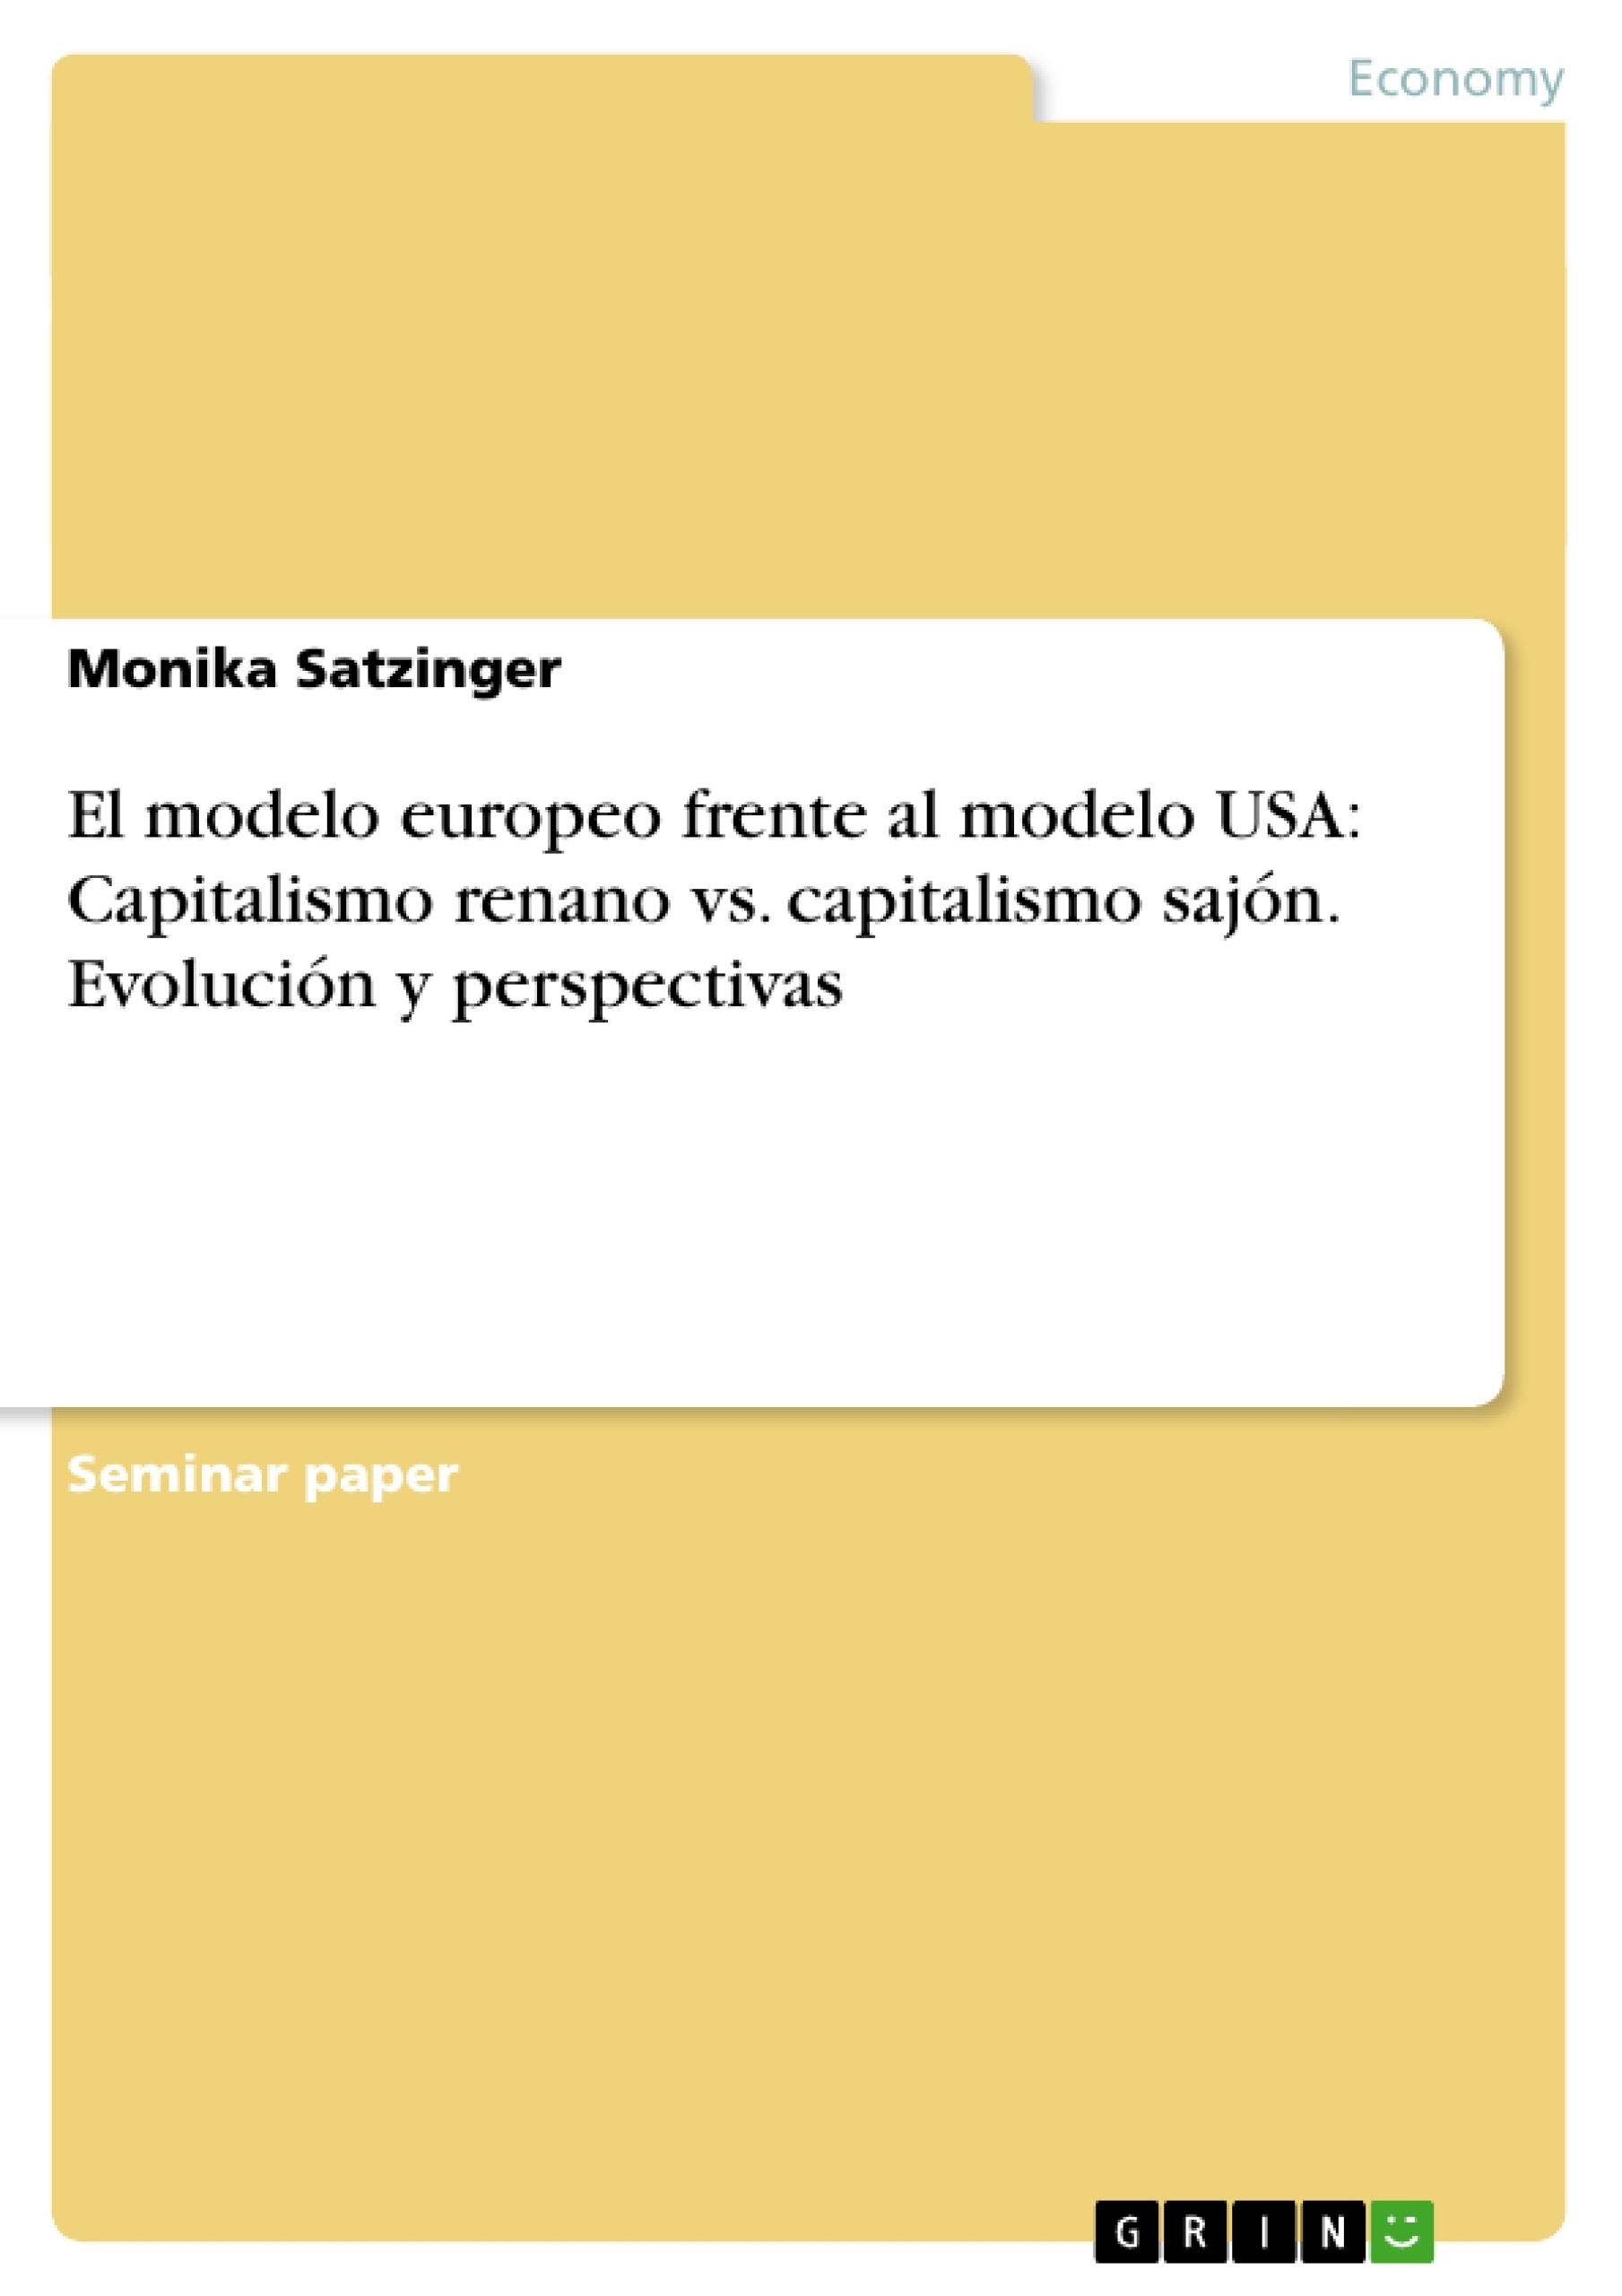 Grin El Modelo Europeo Frente Al Modelo Usa Capitalismo Renano Vs Capitalismo Sajón Evolución Y Perspectivas